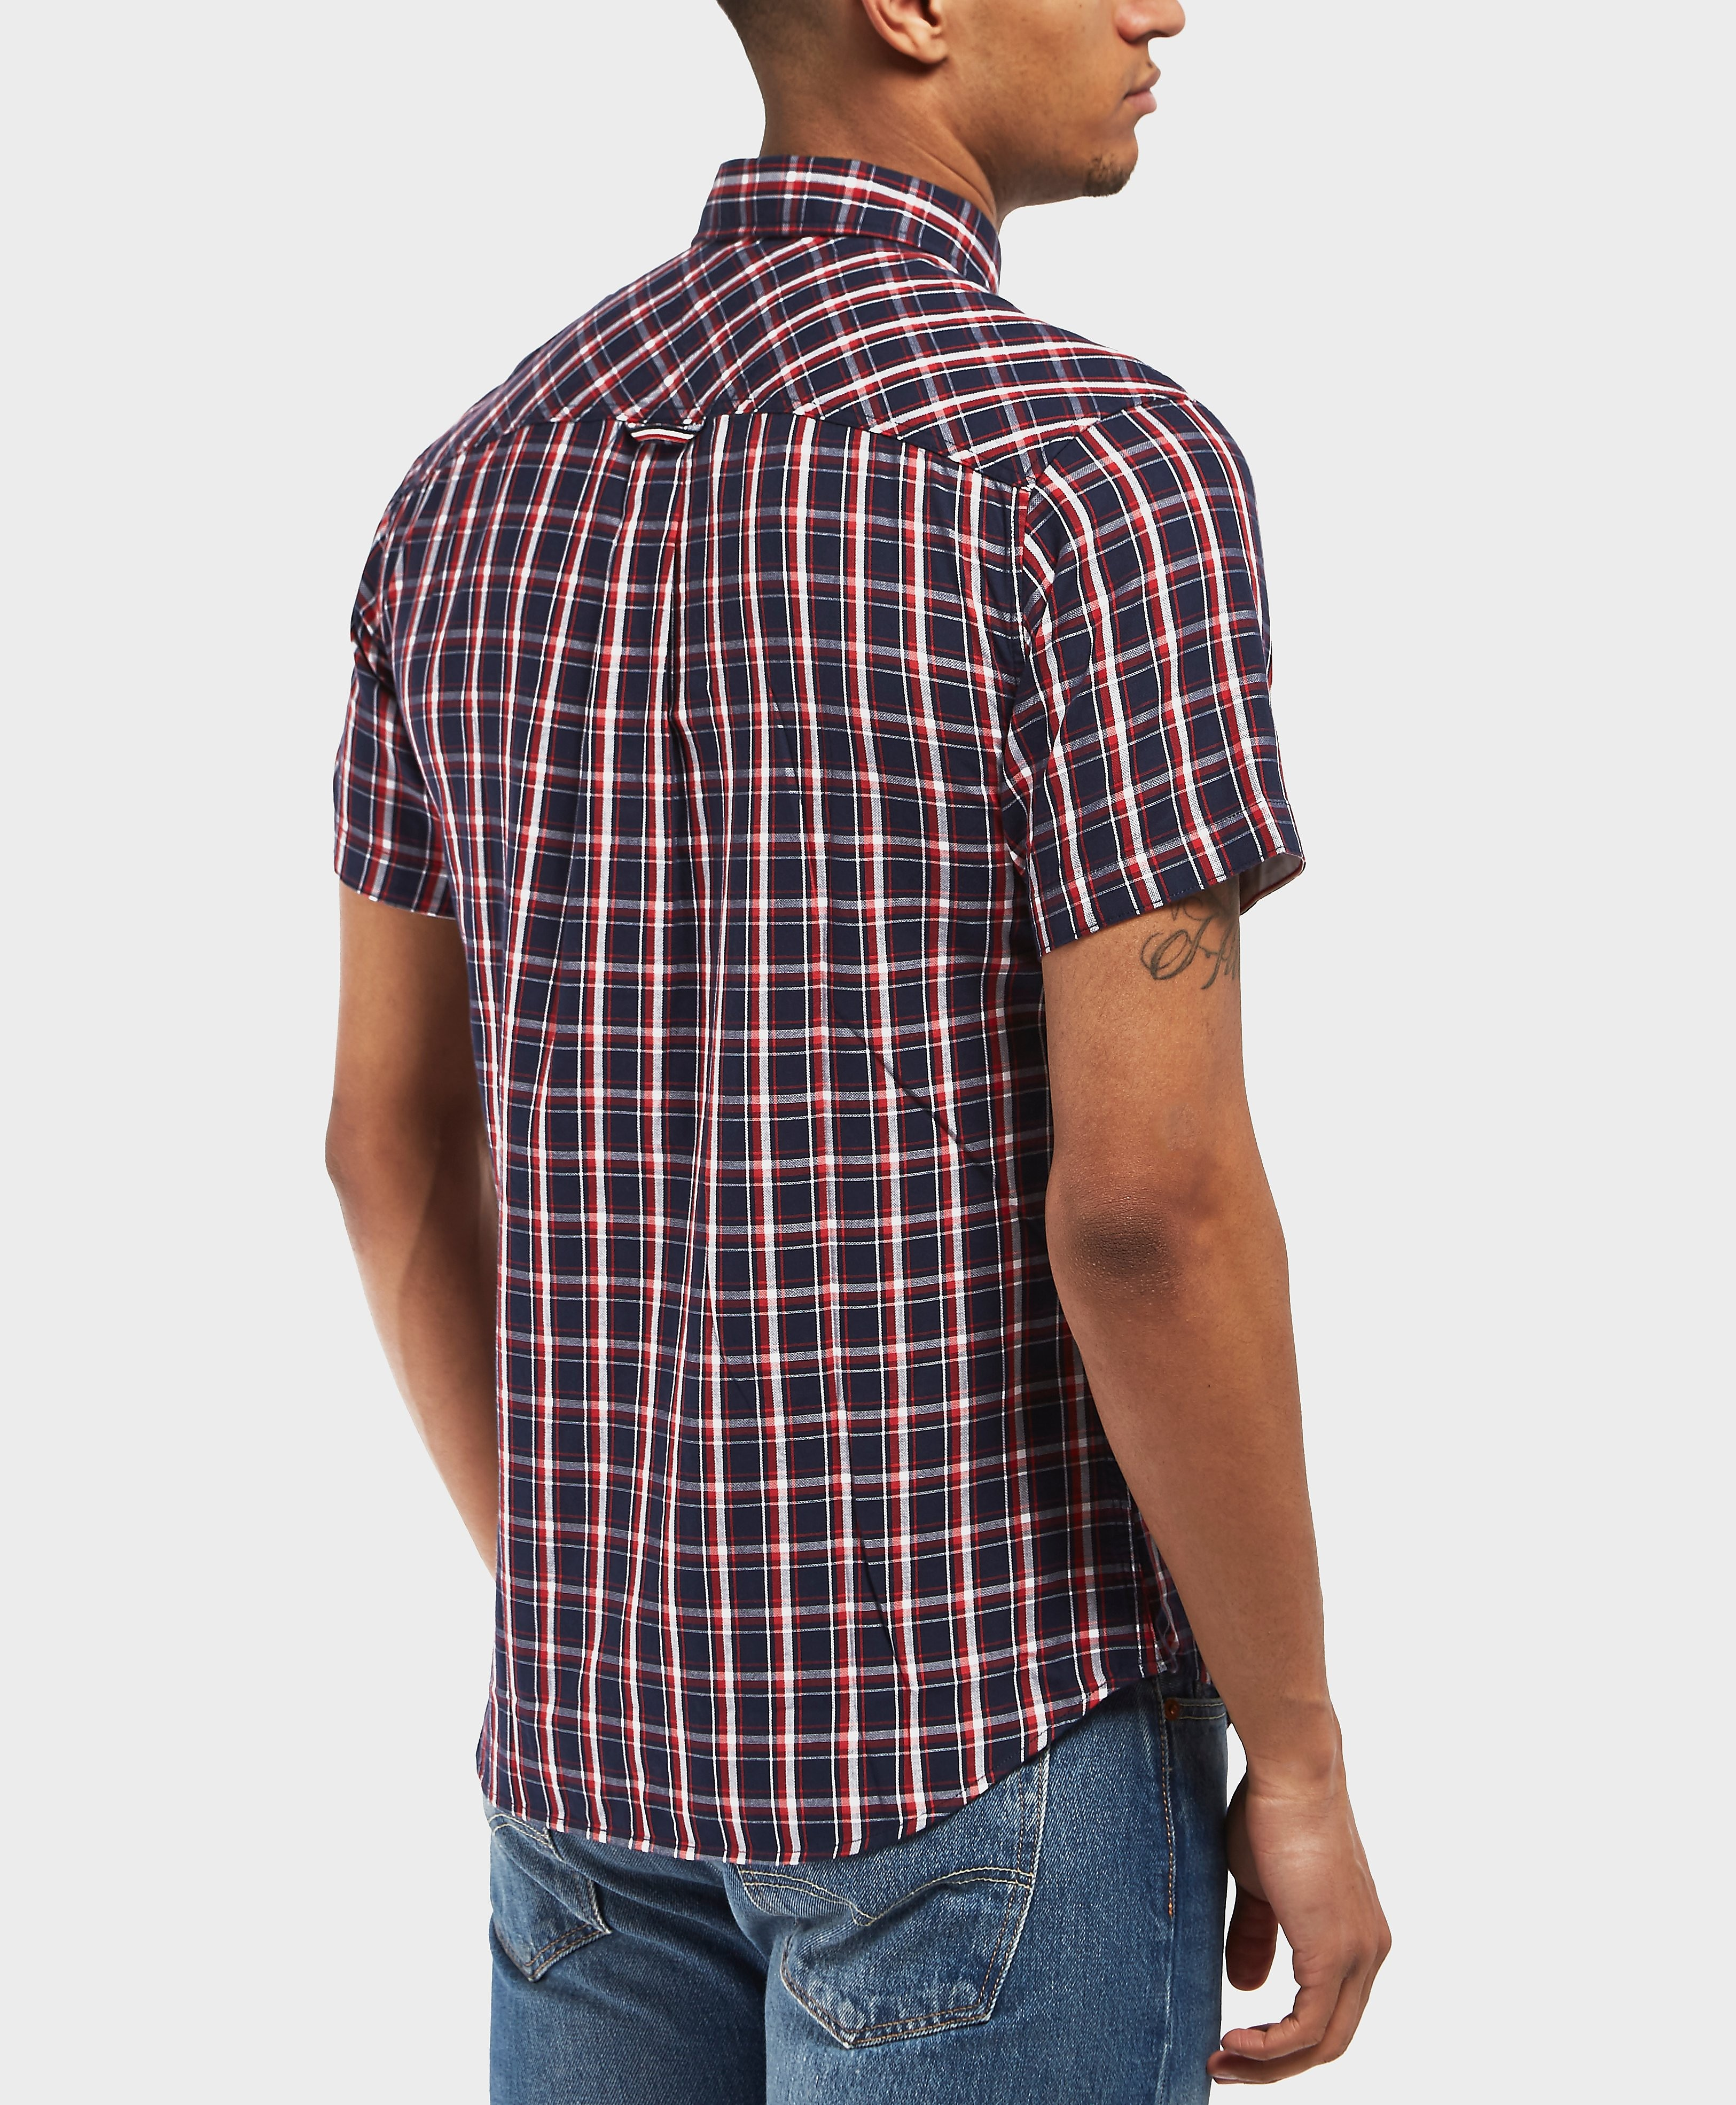 Tommy Hilfiger Short Sleeve Check Shirt